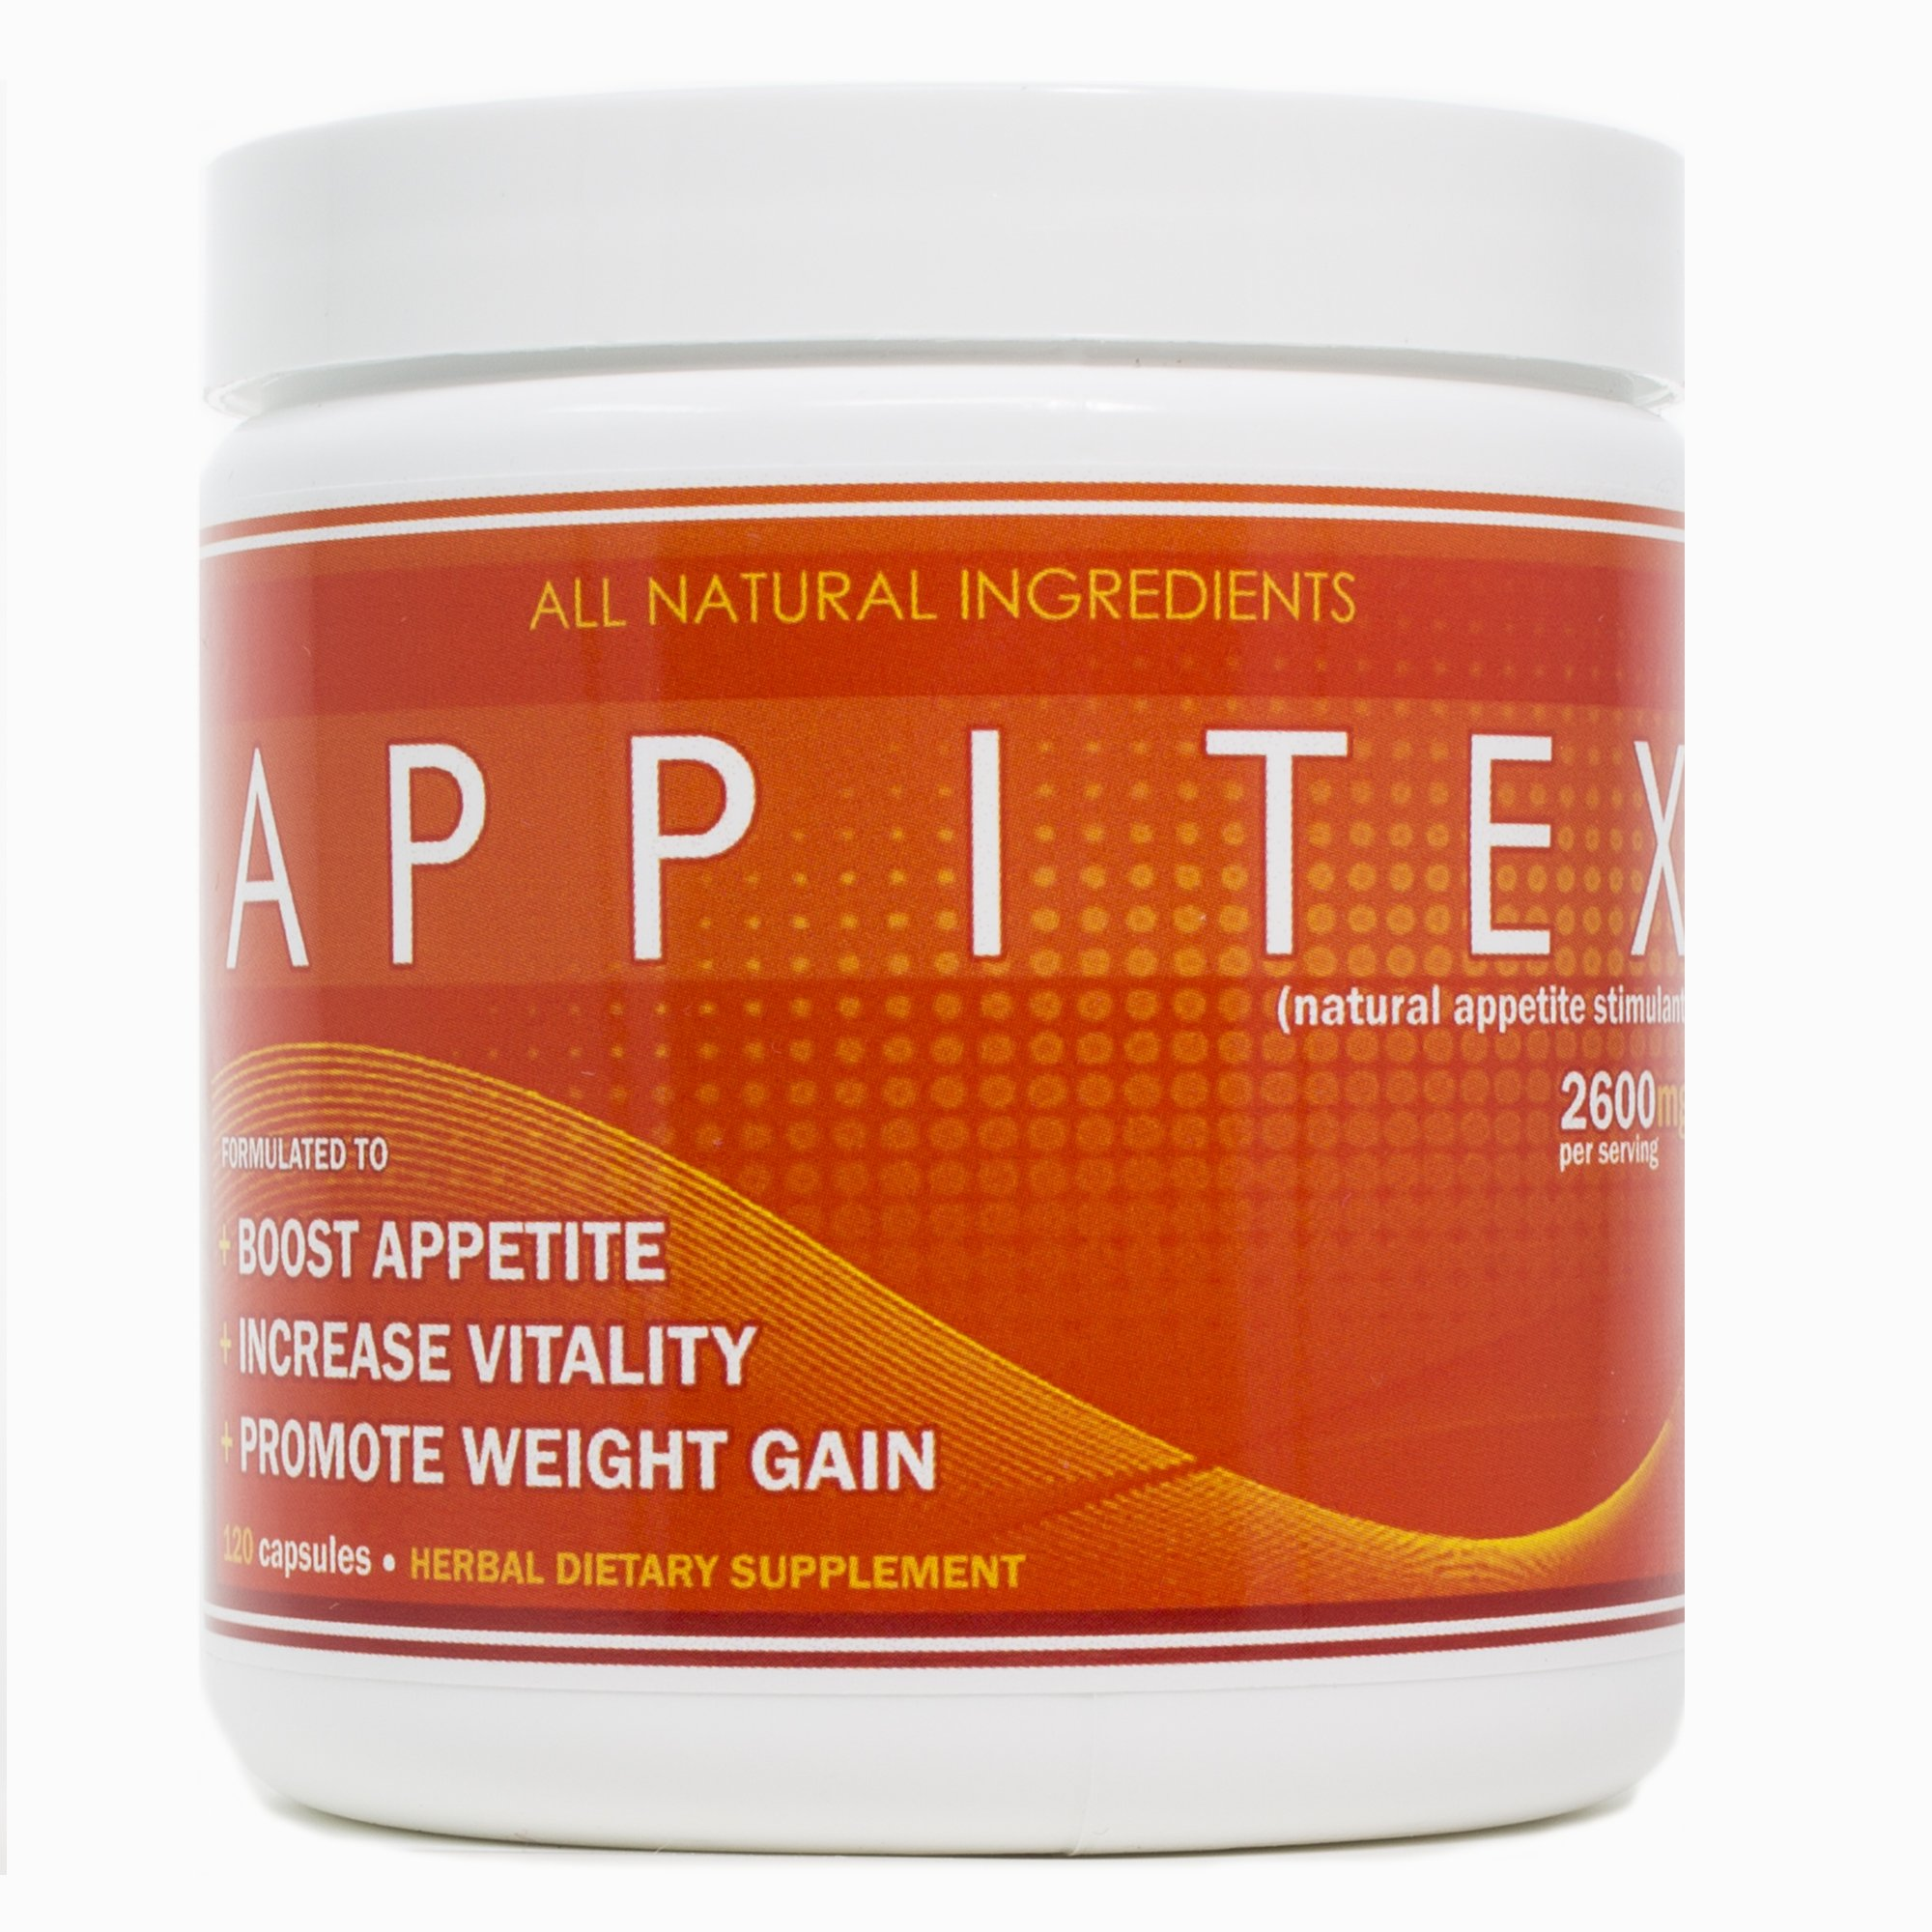 Appitex Weight Gain Pills for Men & Women Appetite Stimulant | Natural Orexigenic Supplement